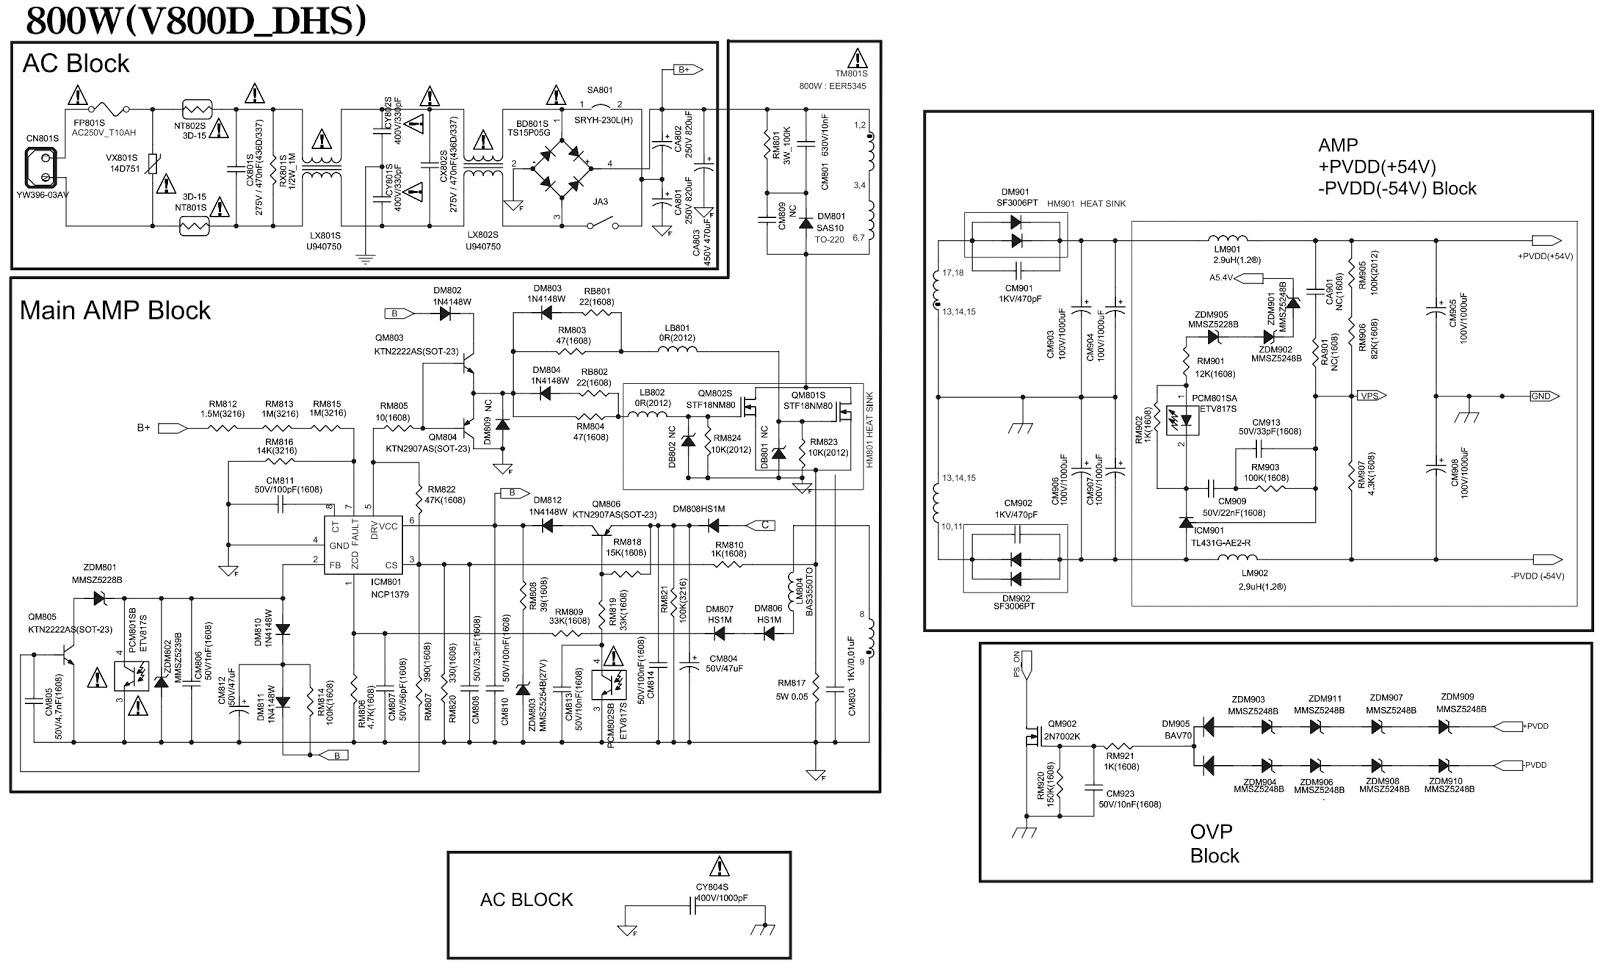 MINI- Compact System – Samsung MX-F870, MX-F870/ZP – SMPS circuit ...